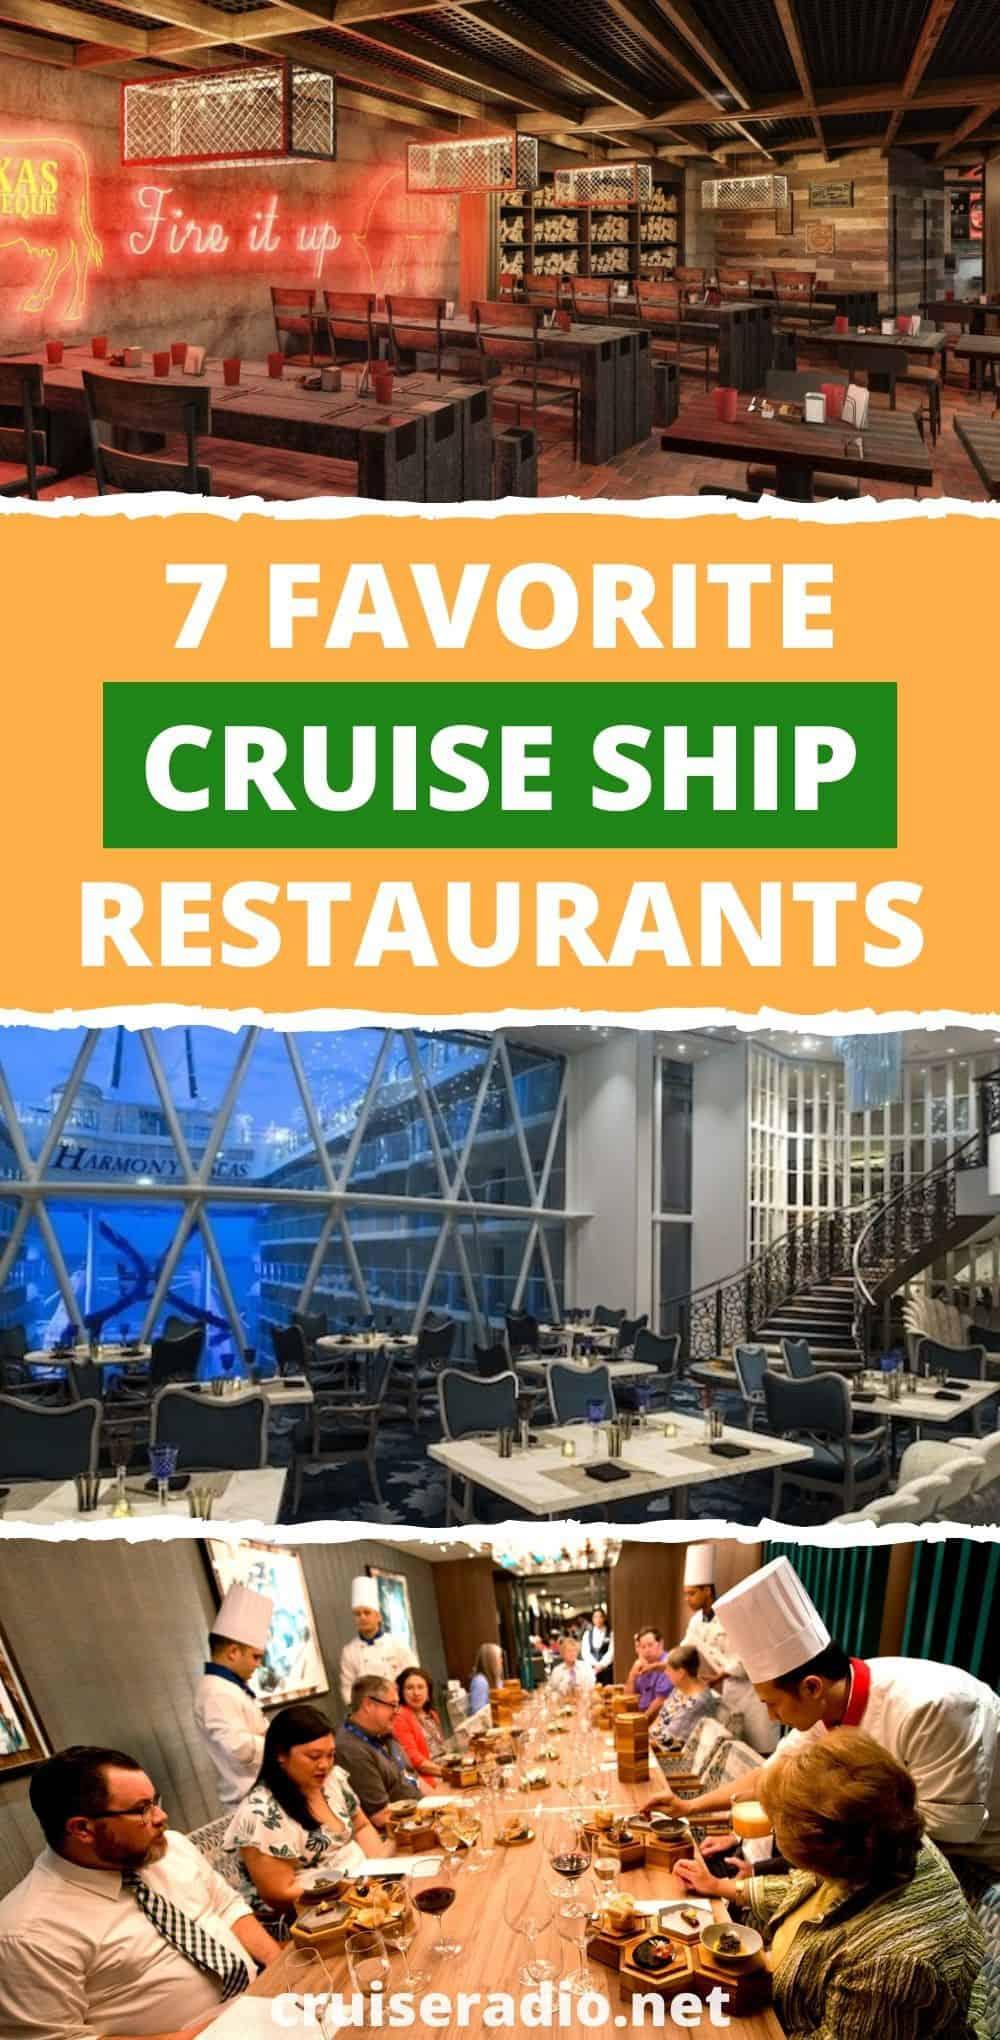 7 favorite cruise ship restaurants